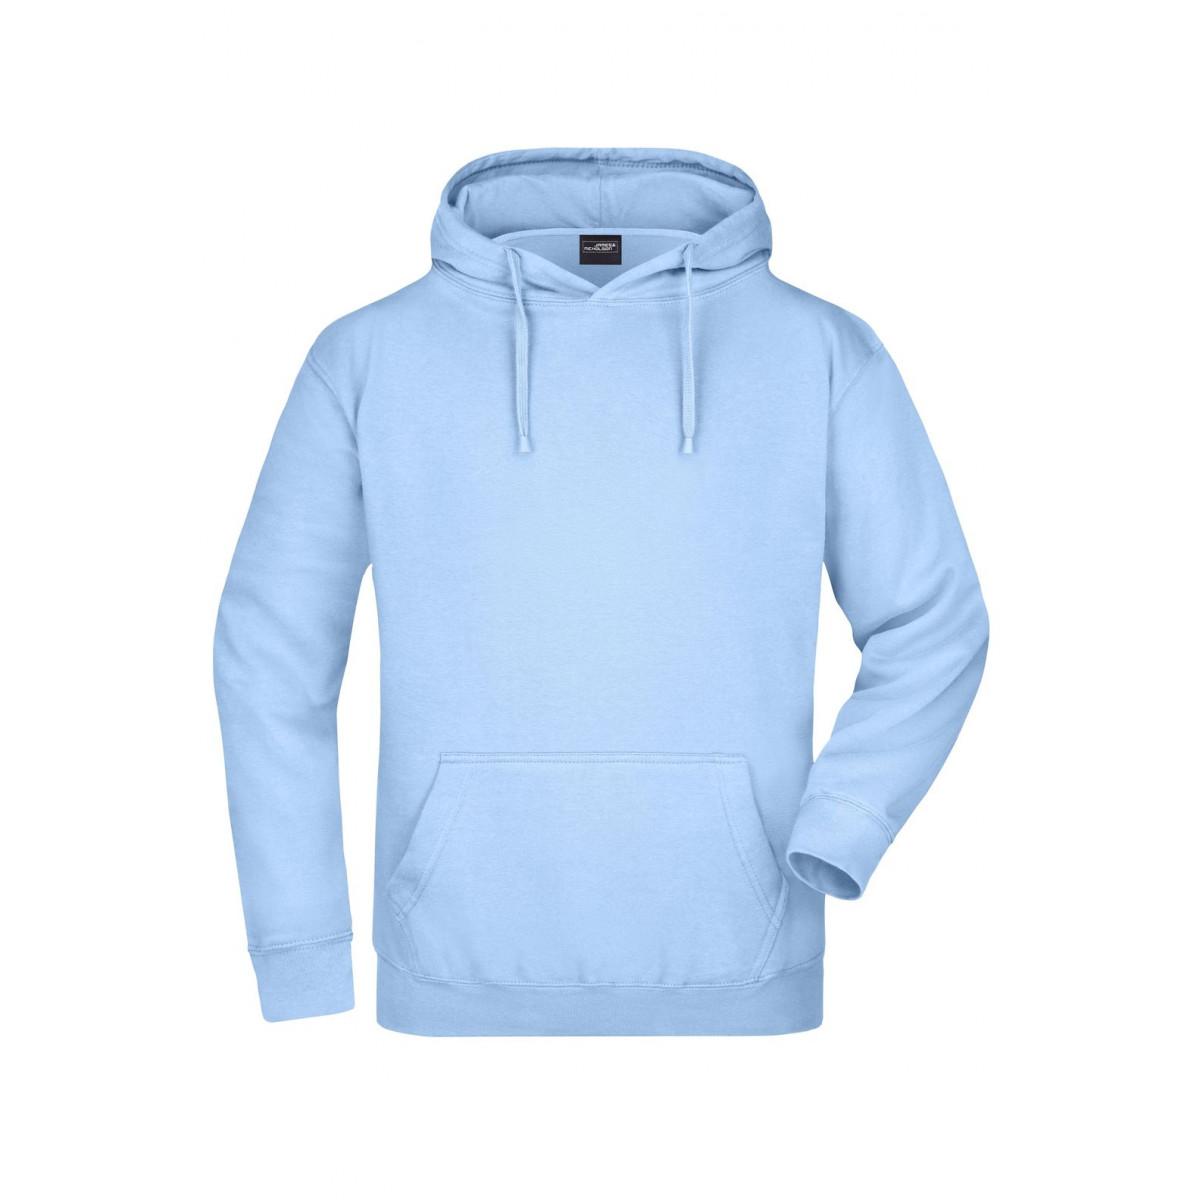 Толстовка мужская JN047 Hooded Sweat - Светло-голубой